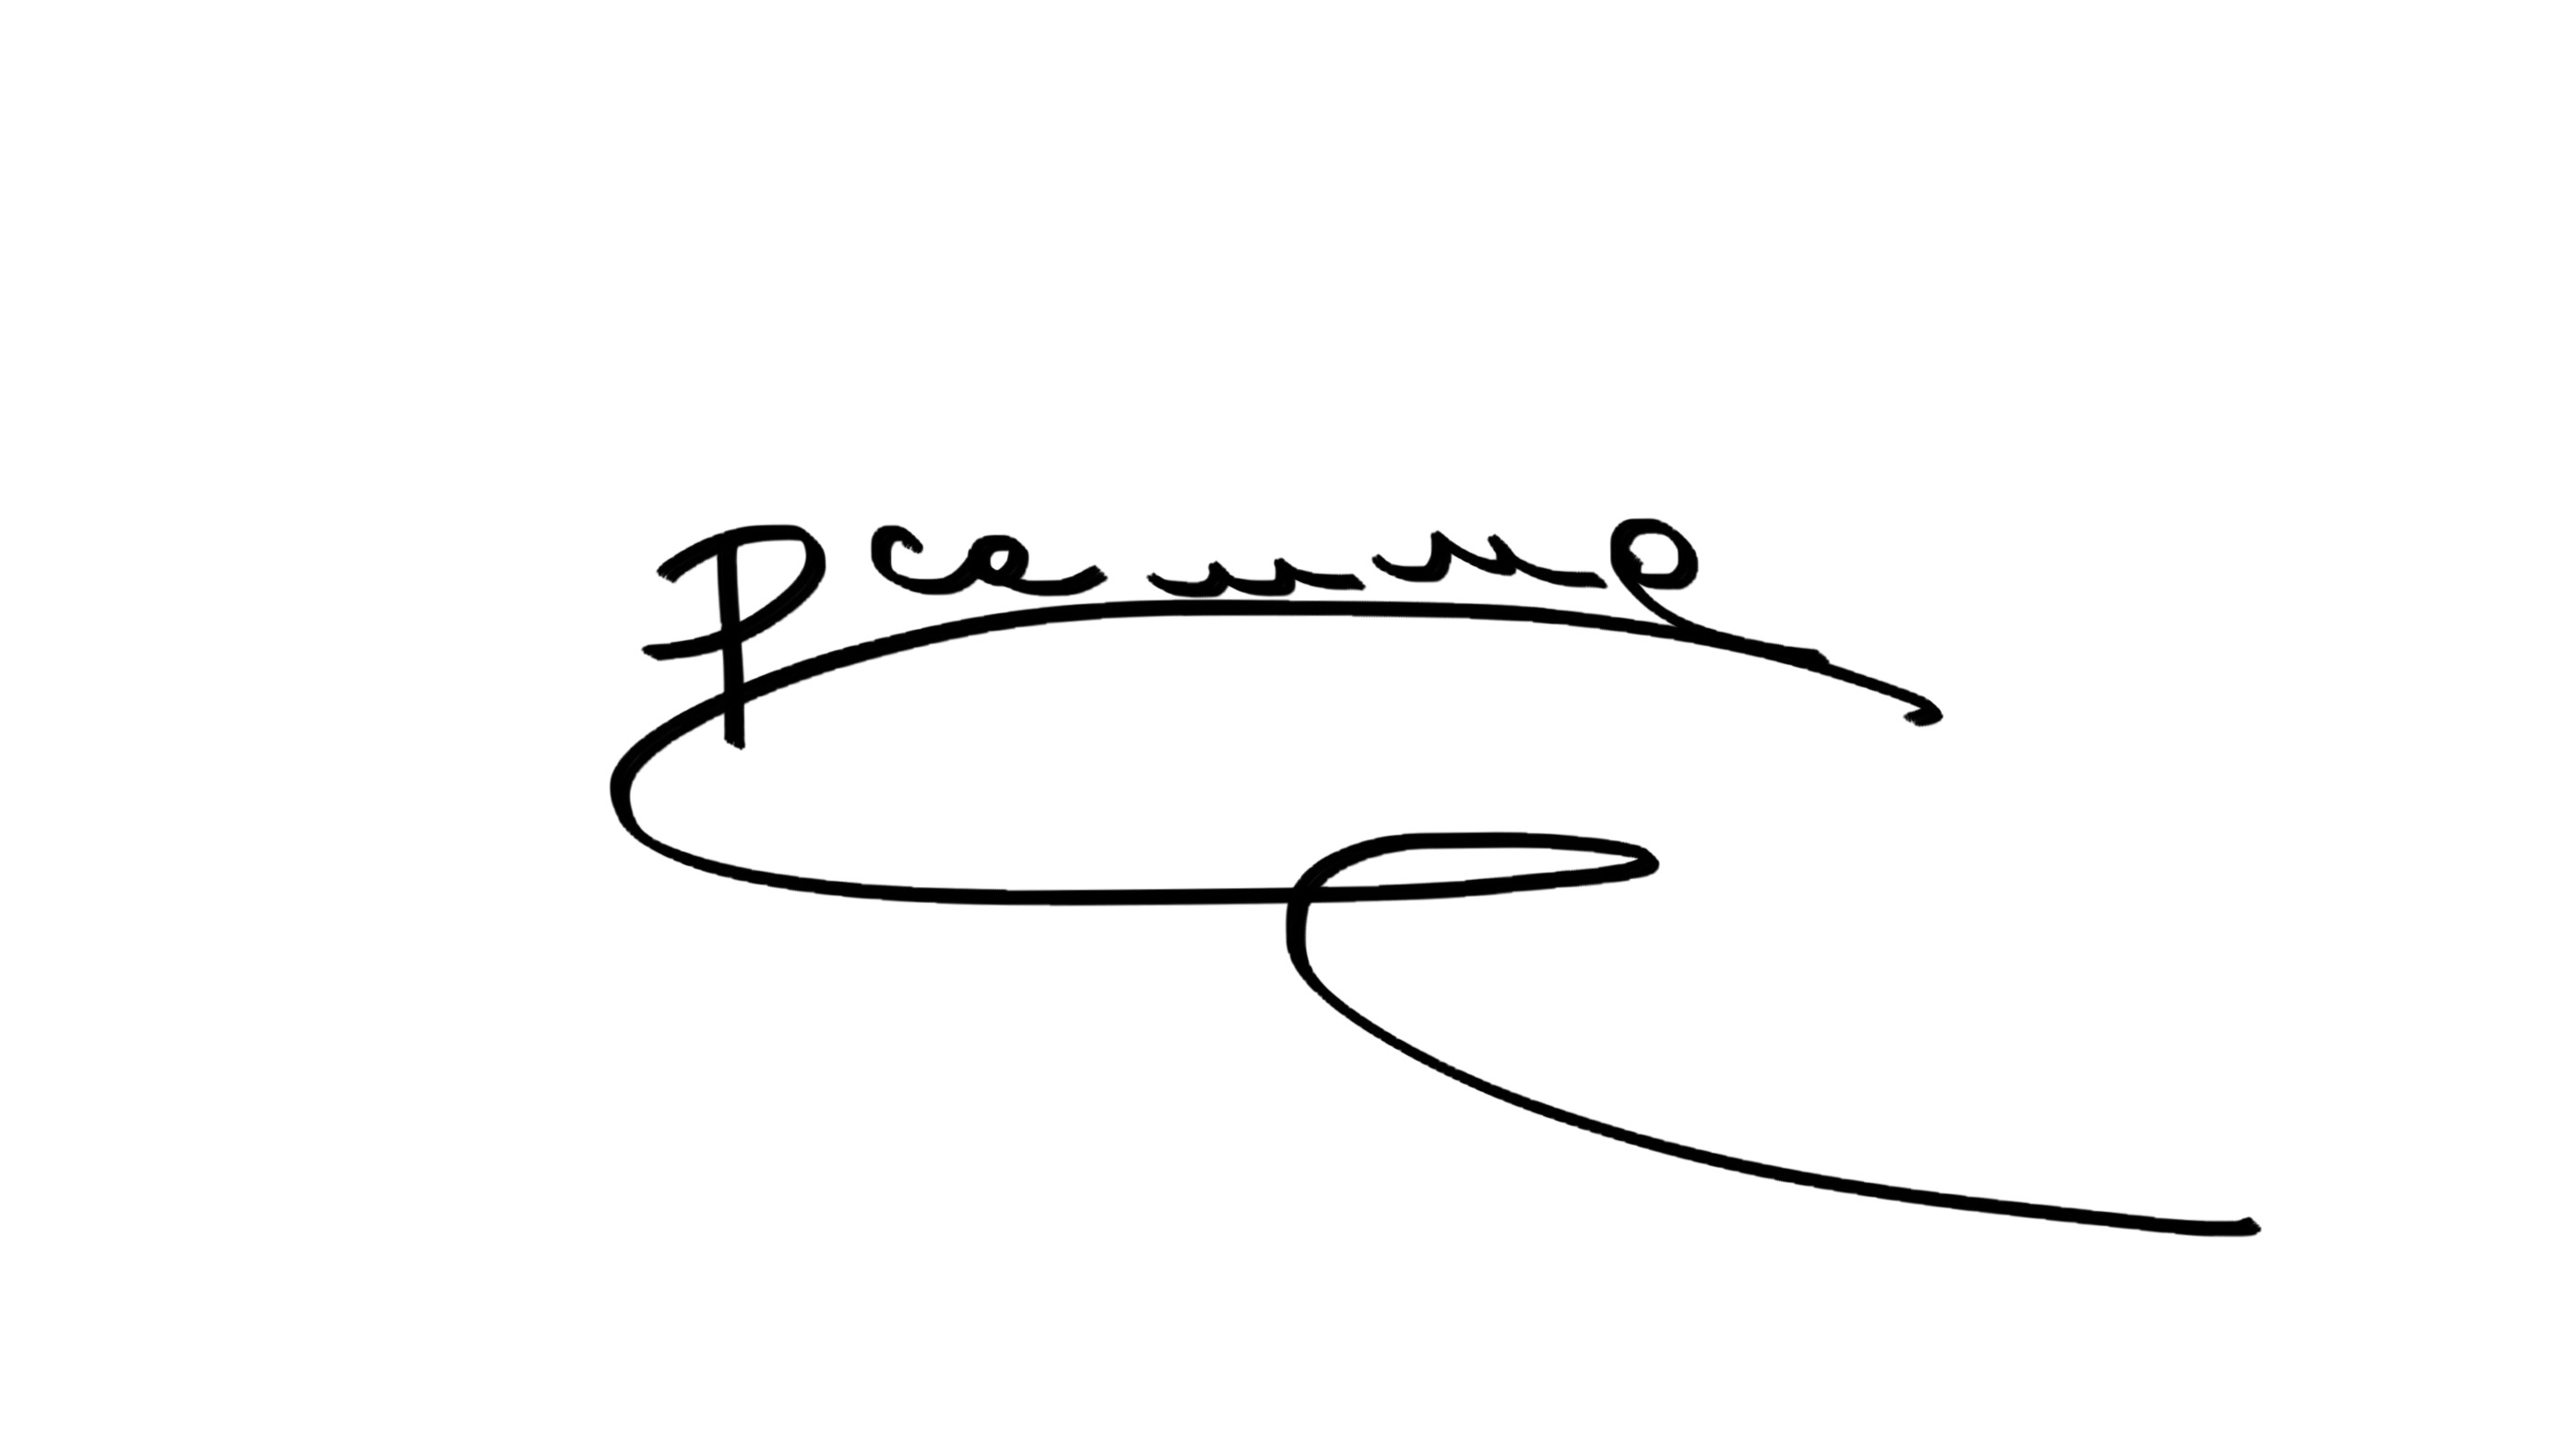 Paola Cammarata's Signature